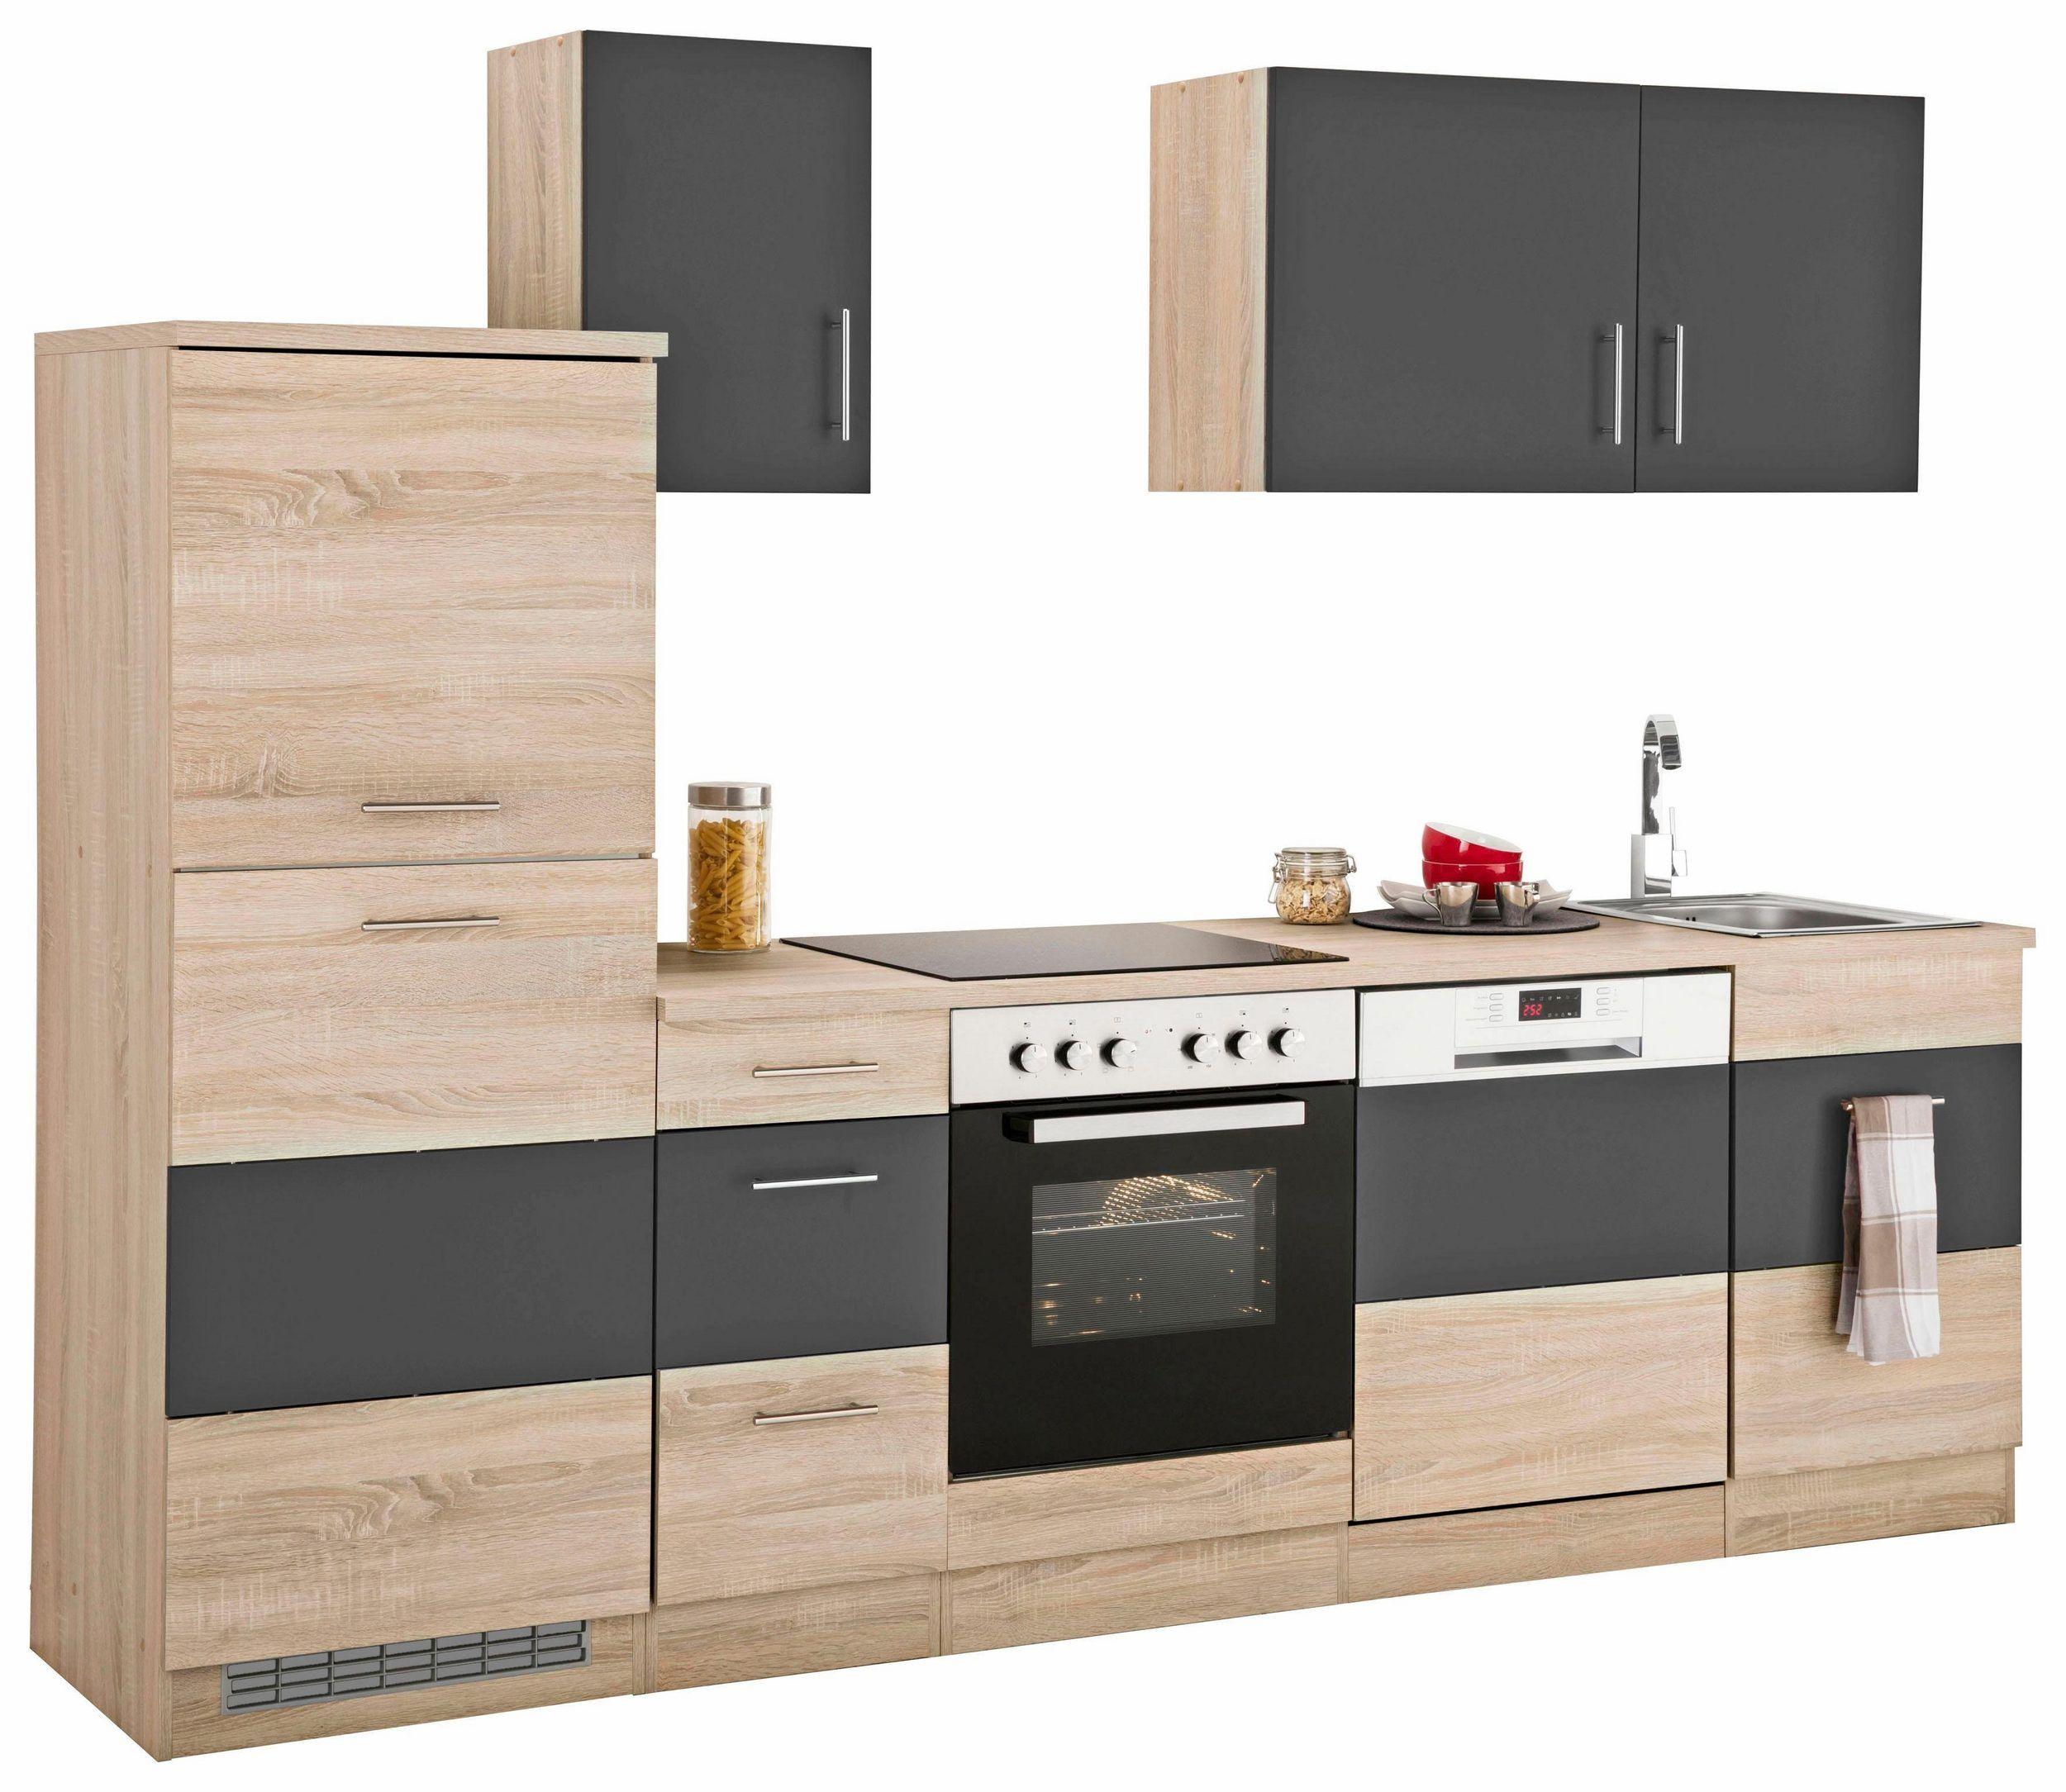 Held Mobel Held Kitchen Cabinets Contemporary Kitchen Decor Room Furnishing Contemporary Kitchen Design